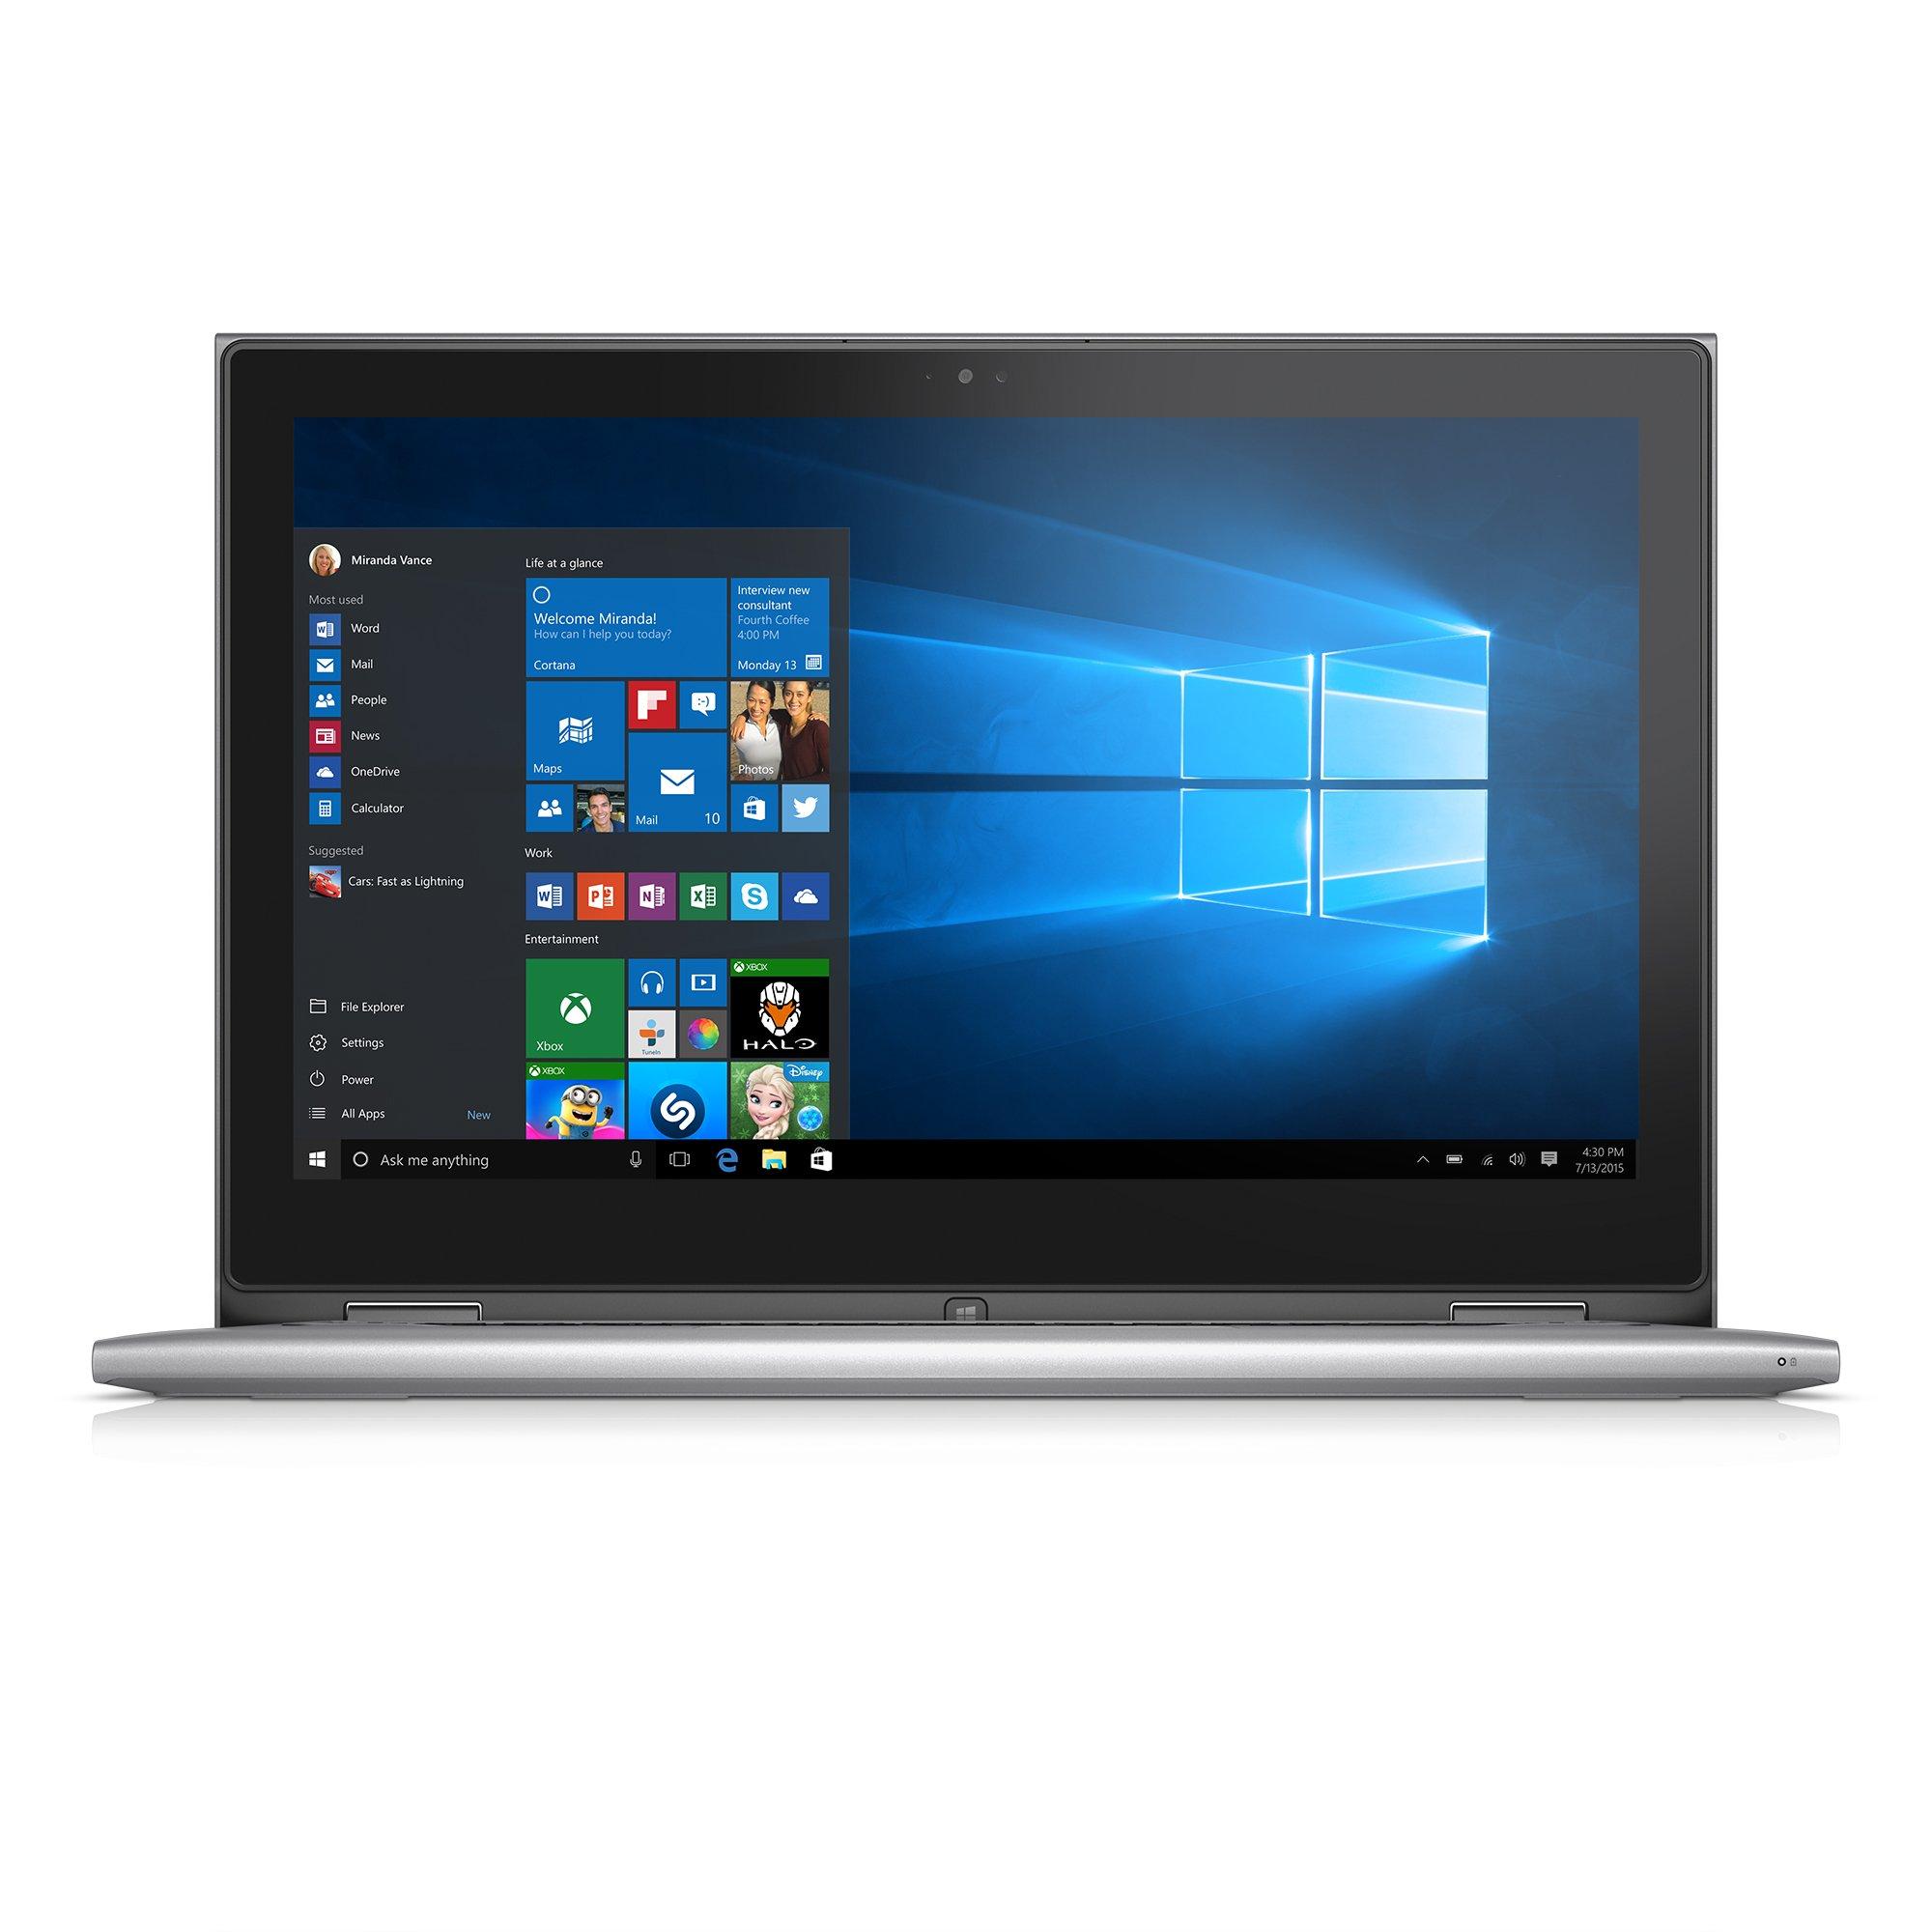 Dell Inspiron i7359-8404SLV 13.3 Inch 2-in-1 Touchscreen Laptop (6th Generation Intel Core i7, 8 GB RAM, 256 GB SSD)